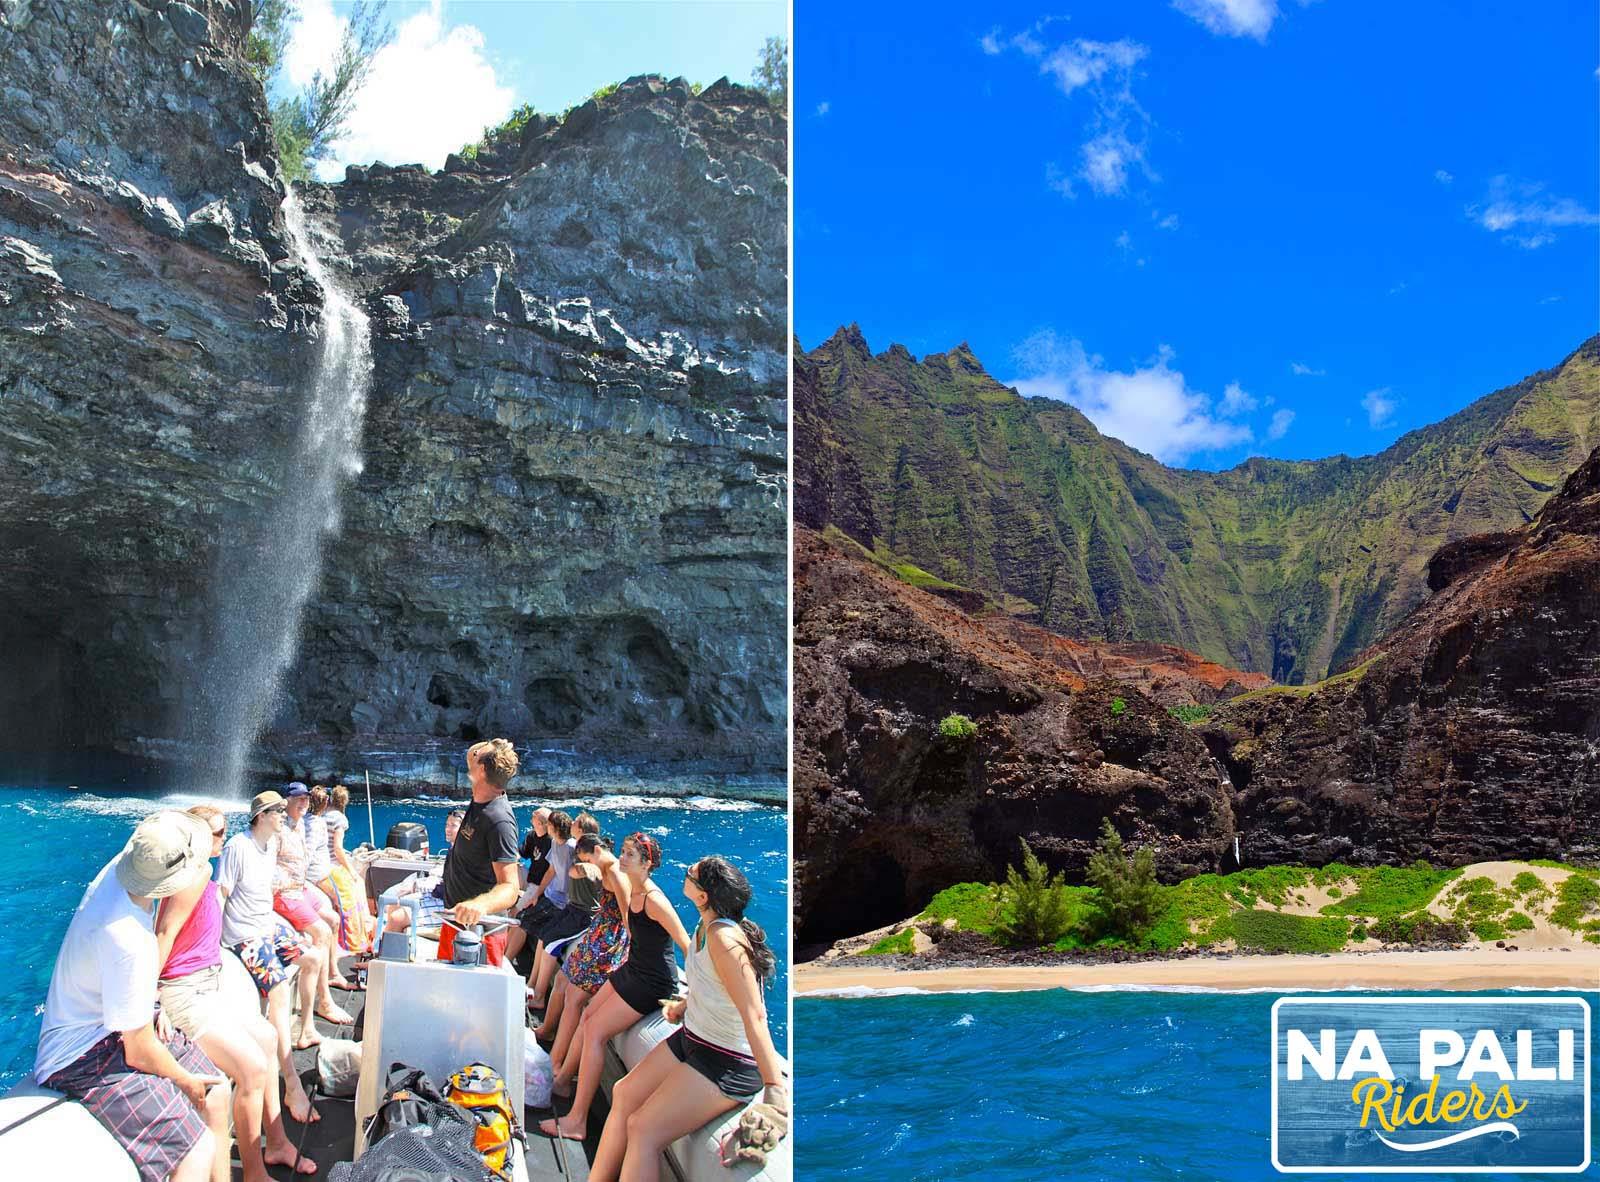 Take a raft tour of Na Pali Coast